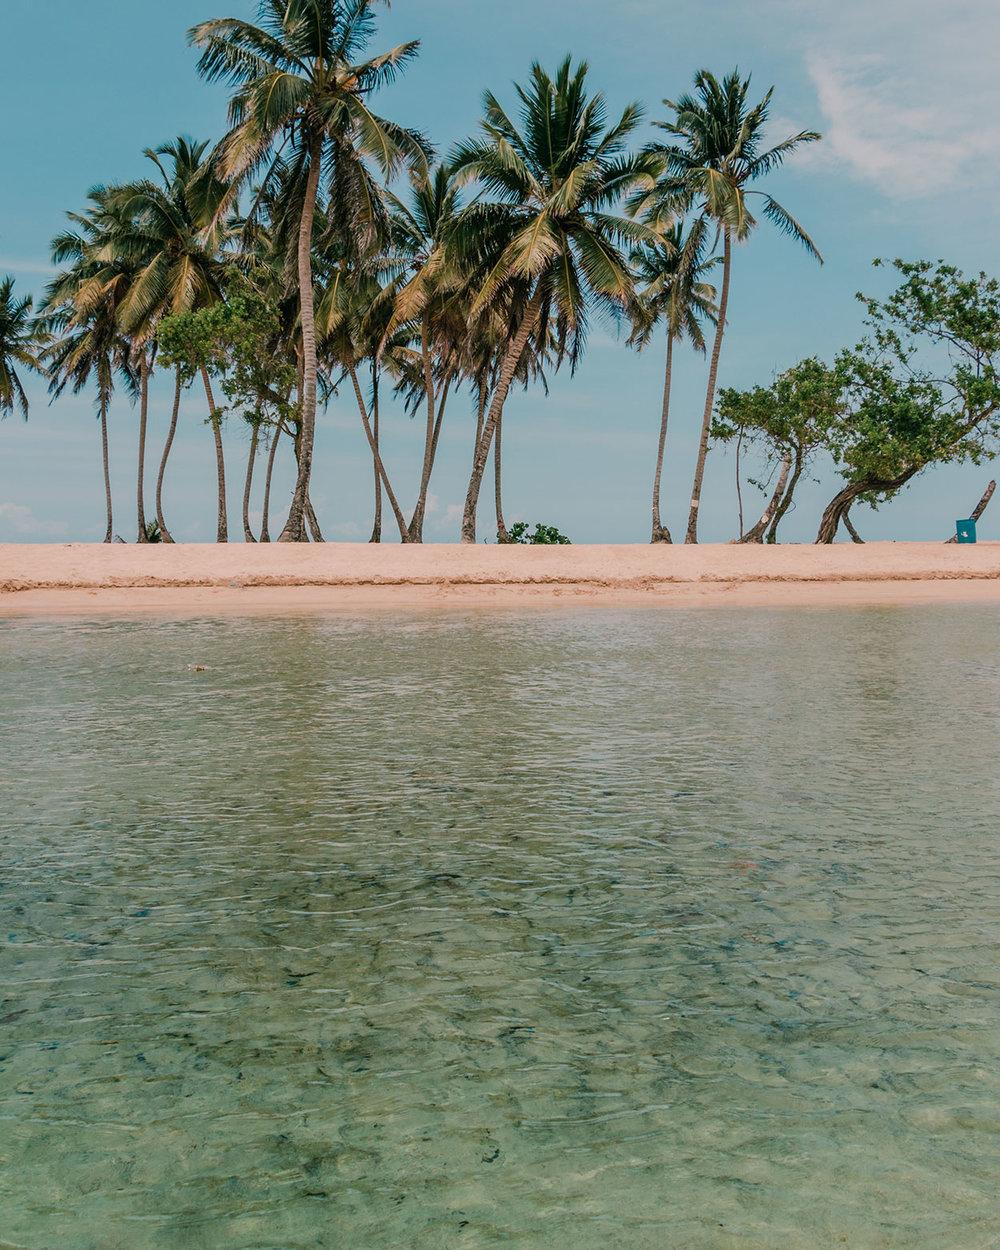 Arroyo Salado - playa con balneario